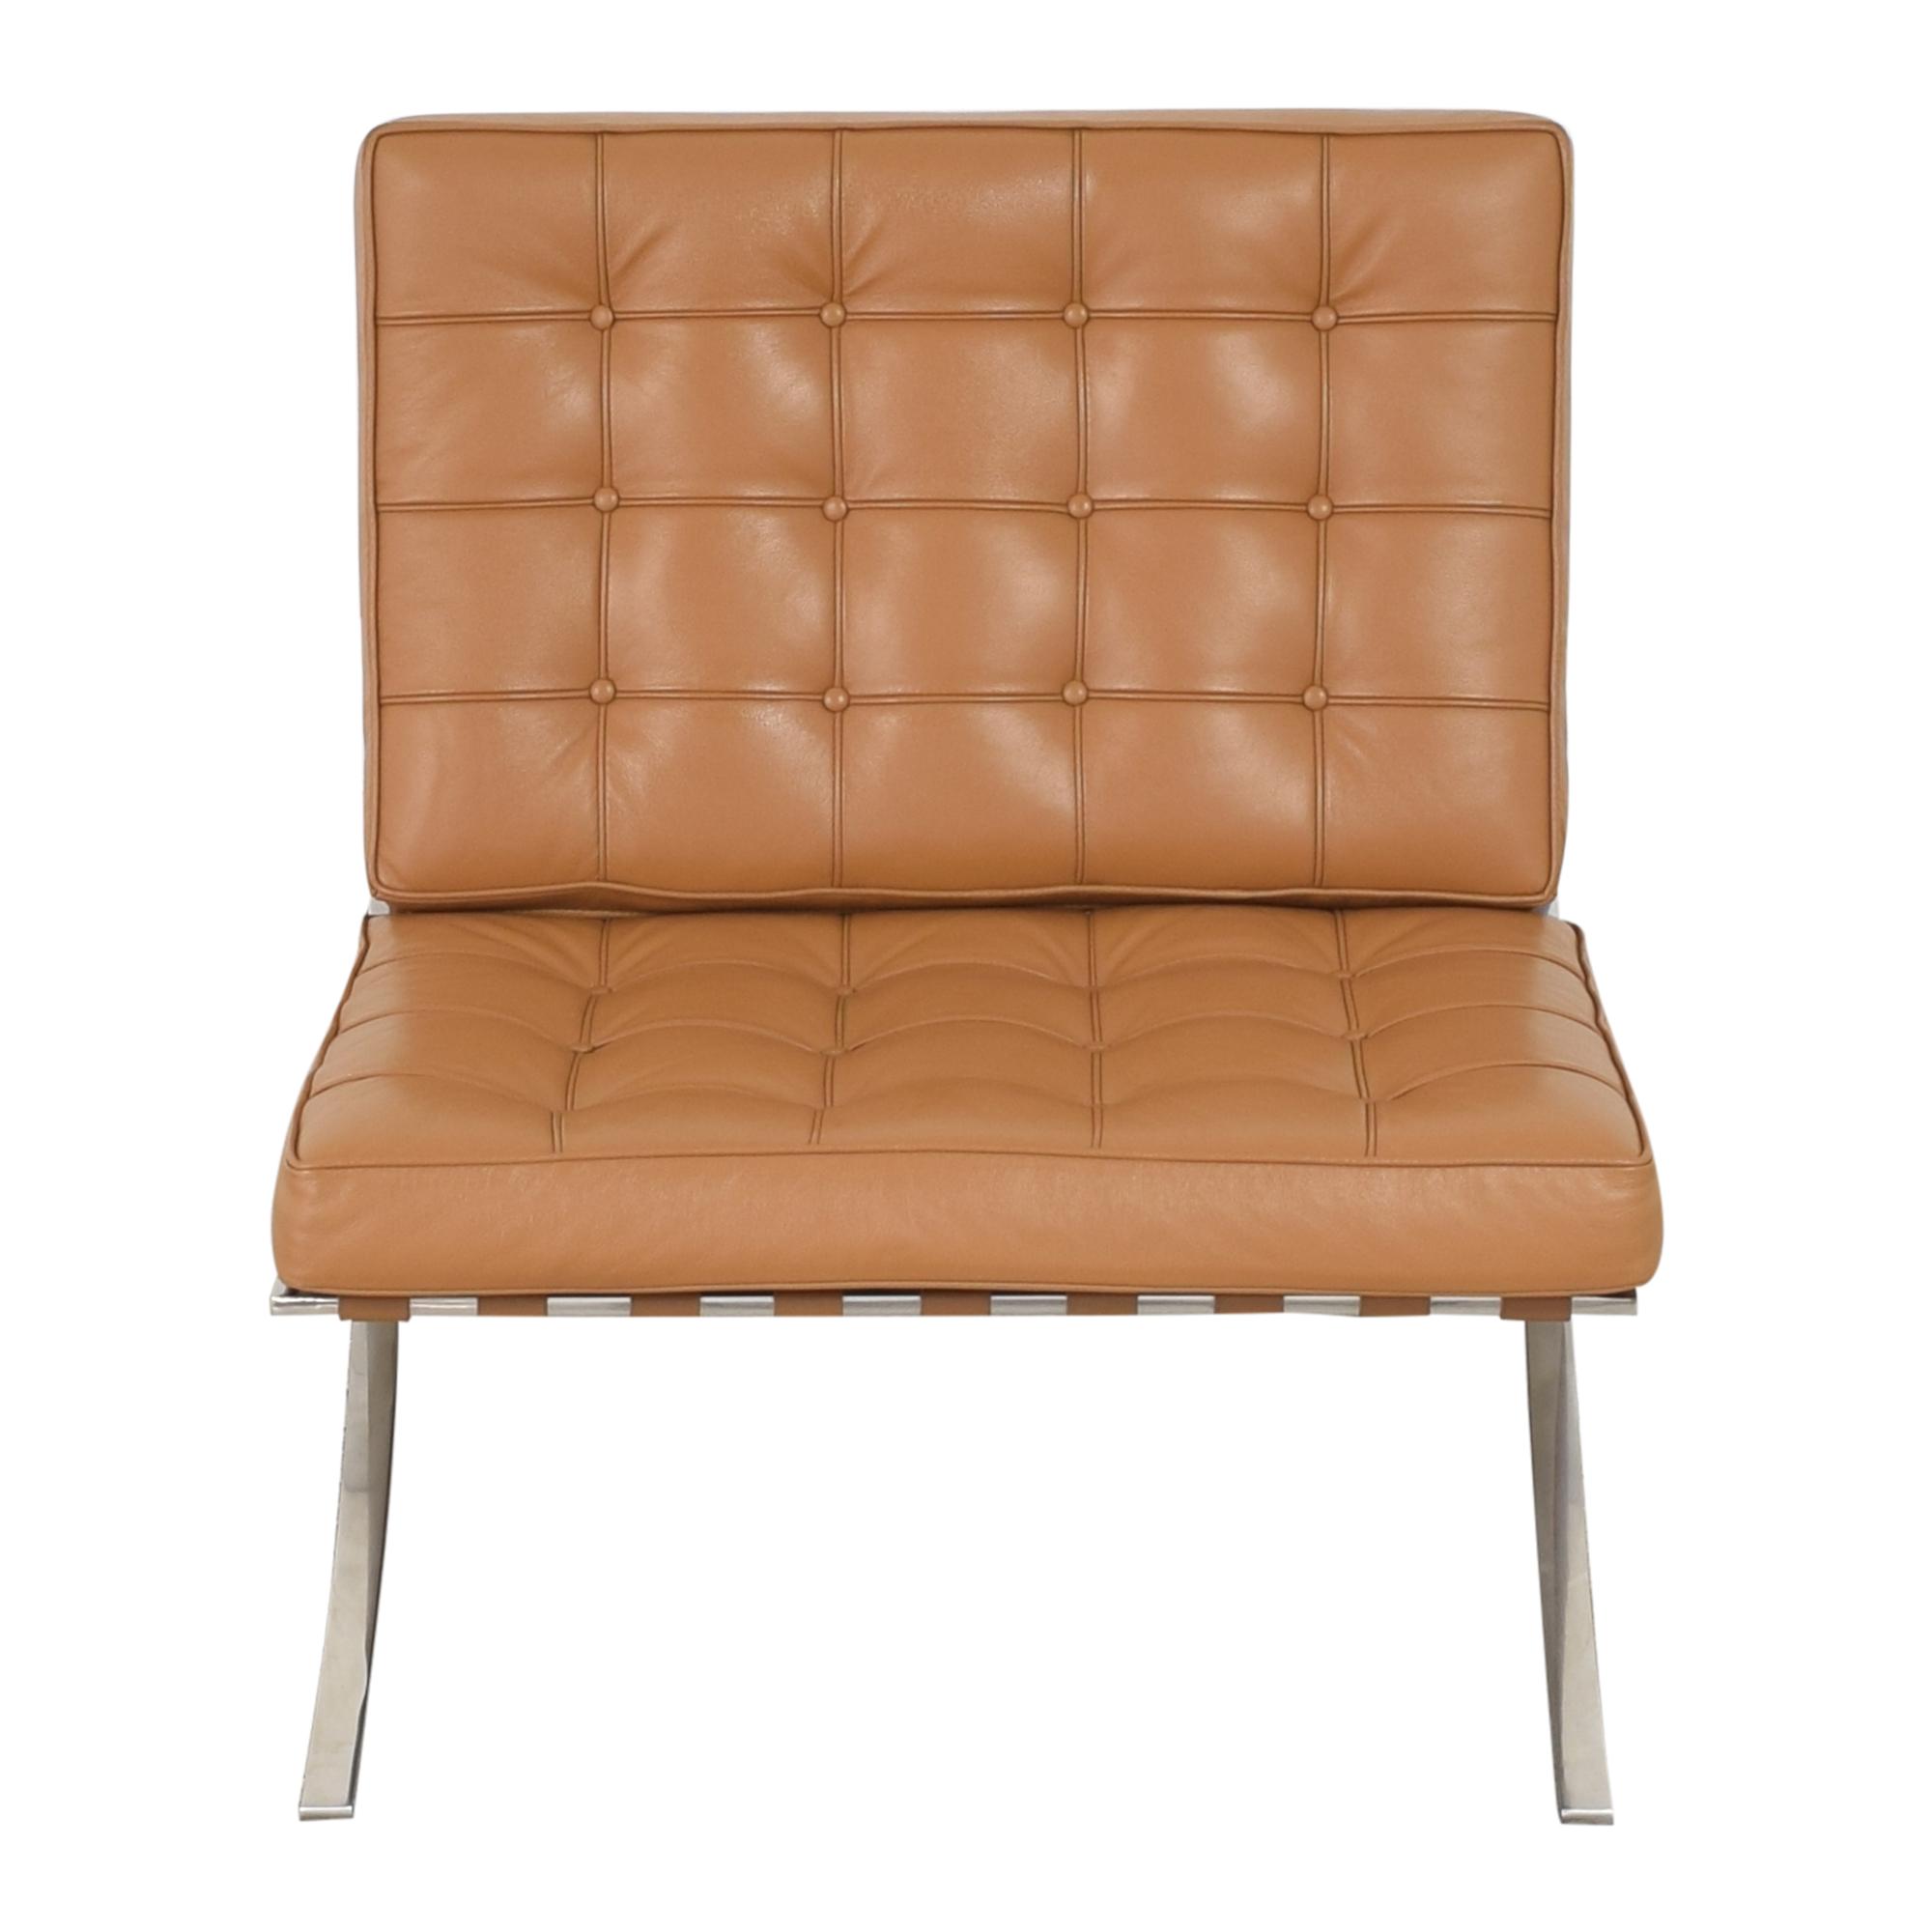 Modern Classics Modern Classics Barcelona Chair Replica